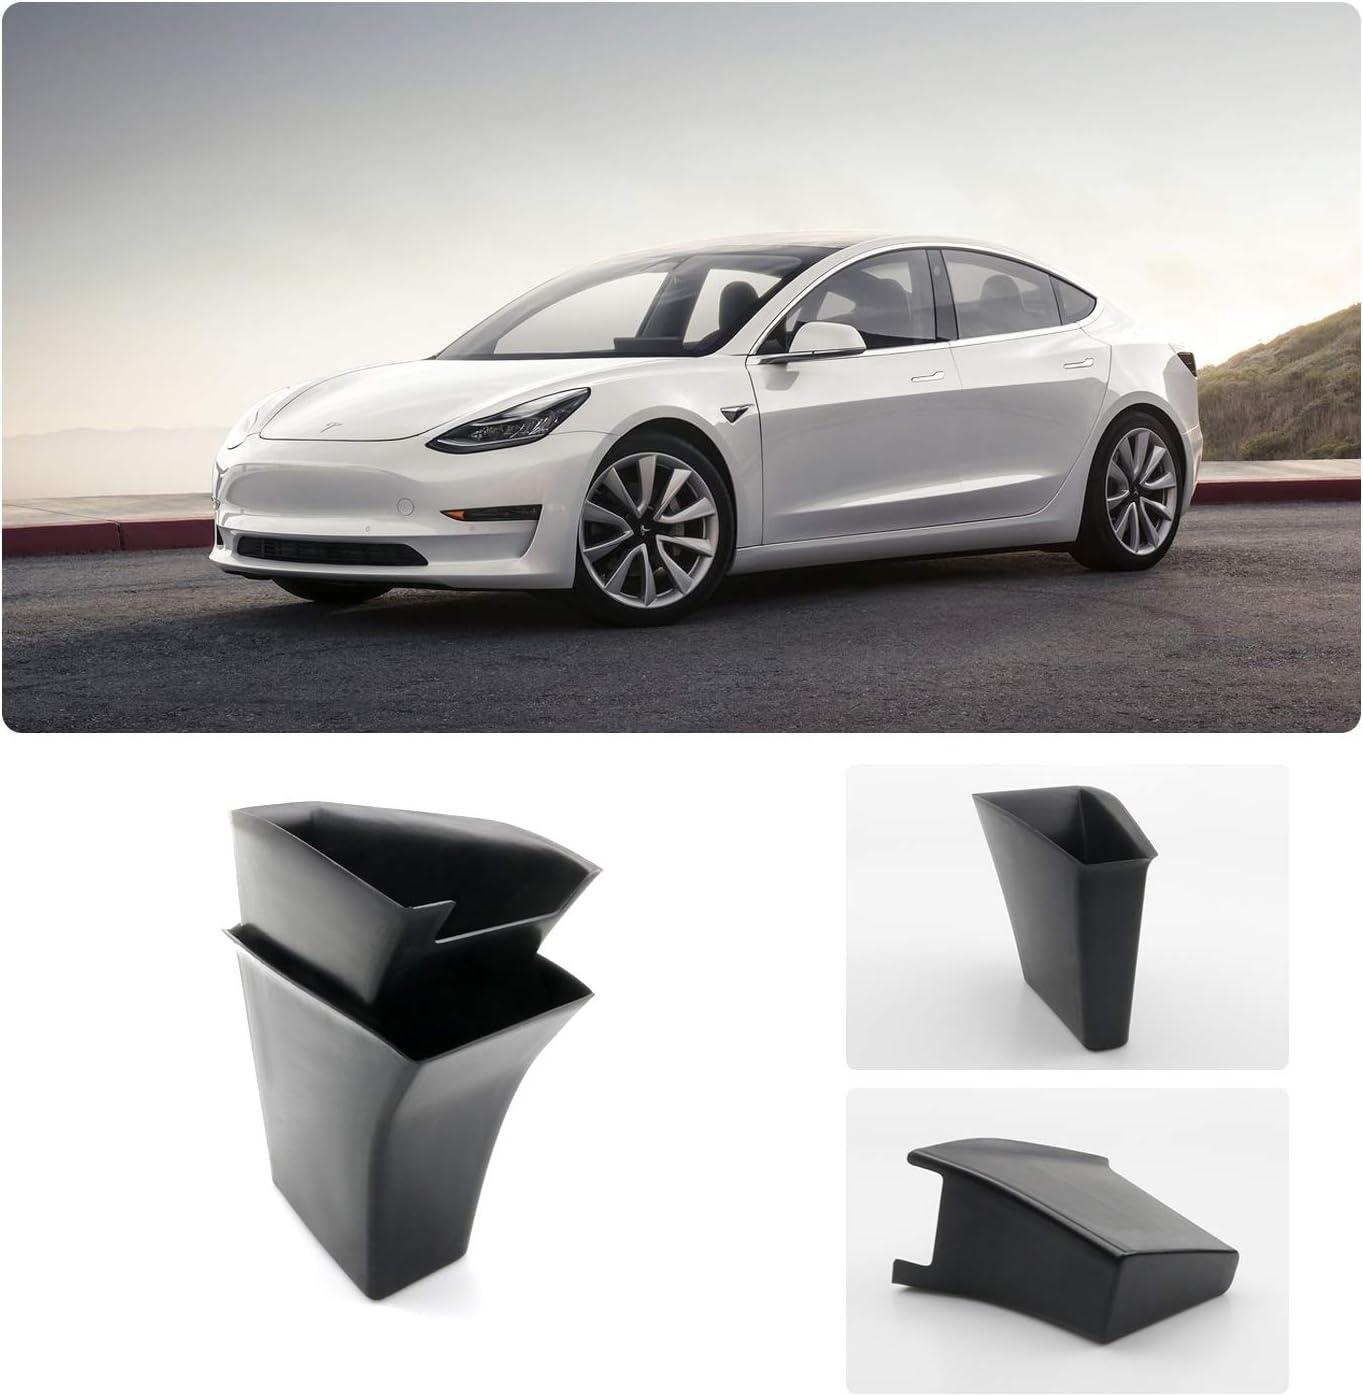 YEE PIN Tesla Model 3 Armrest Container Organizer Tray Organizer Tray Door Side Pallets Handle Pocket Fits for 2018 2019 Tesla Model 3 Storing Little Stuff 2PCS